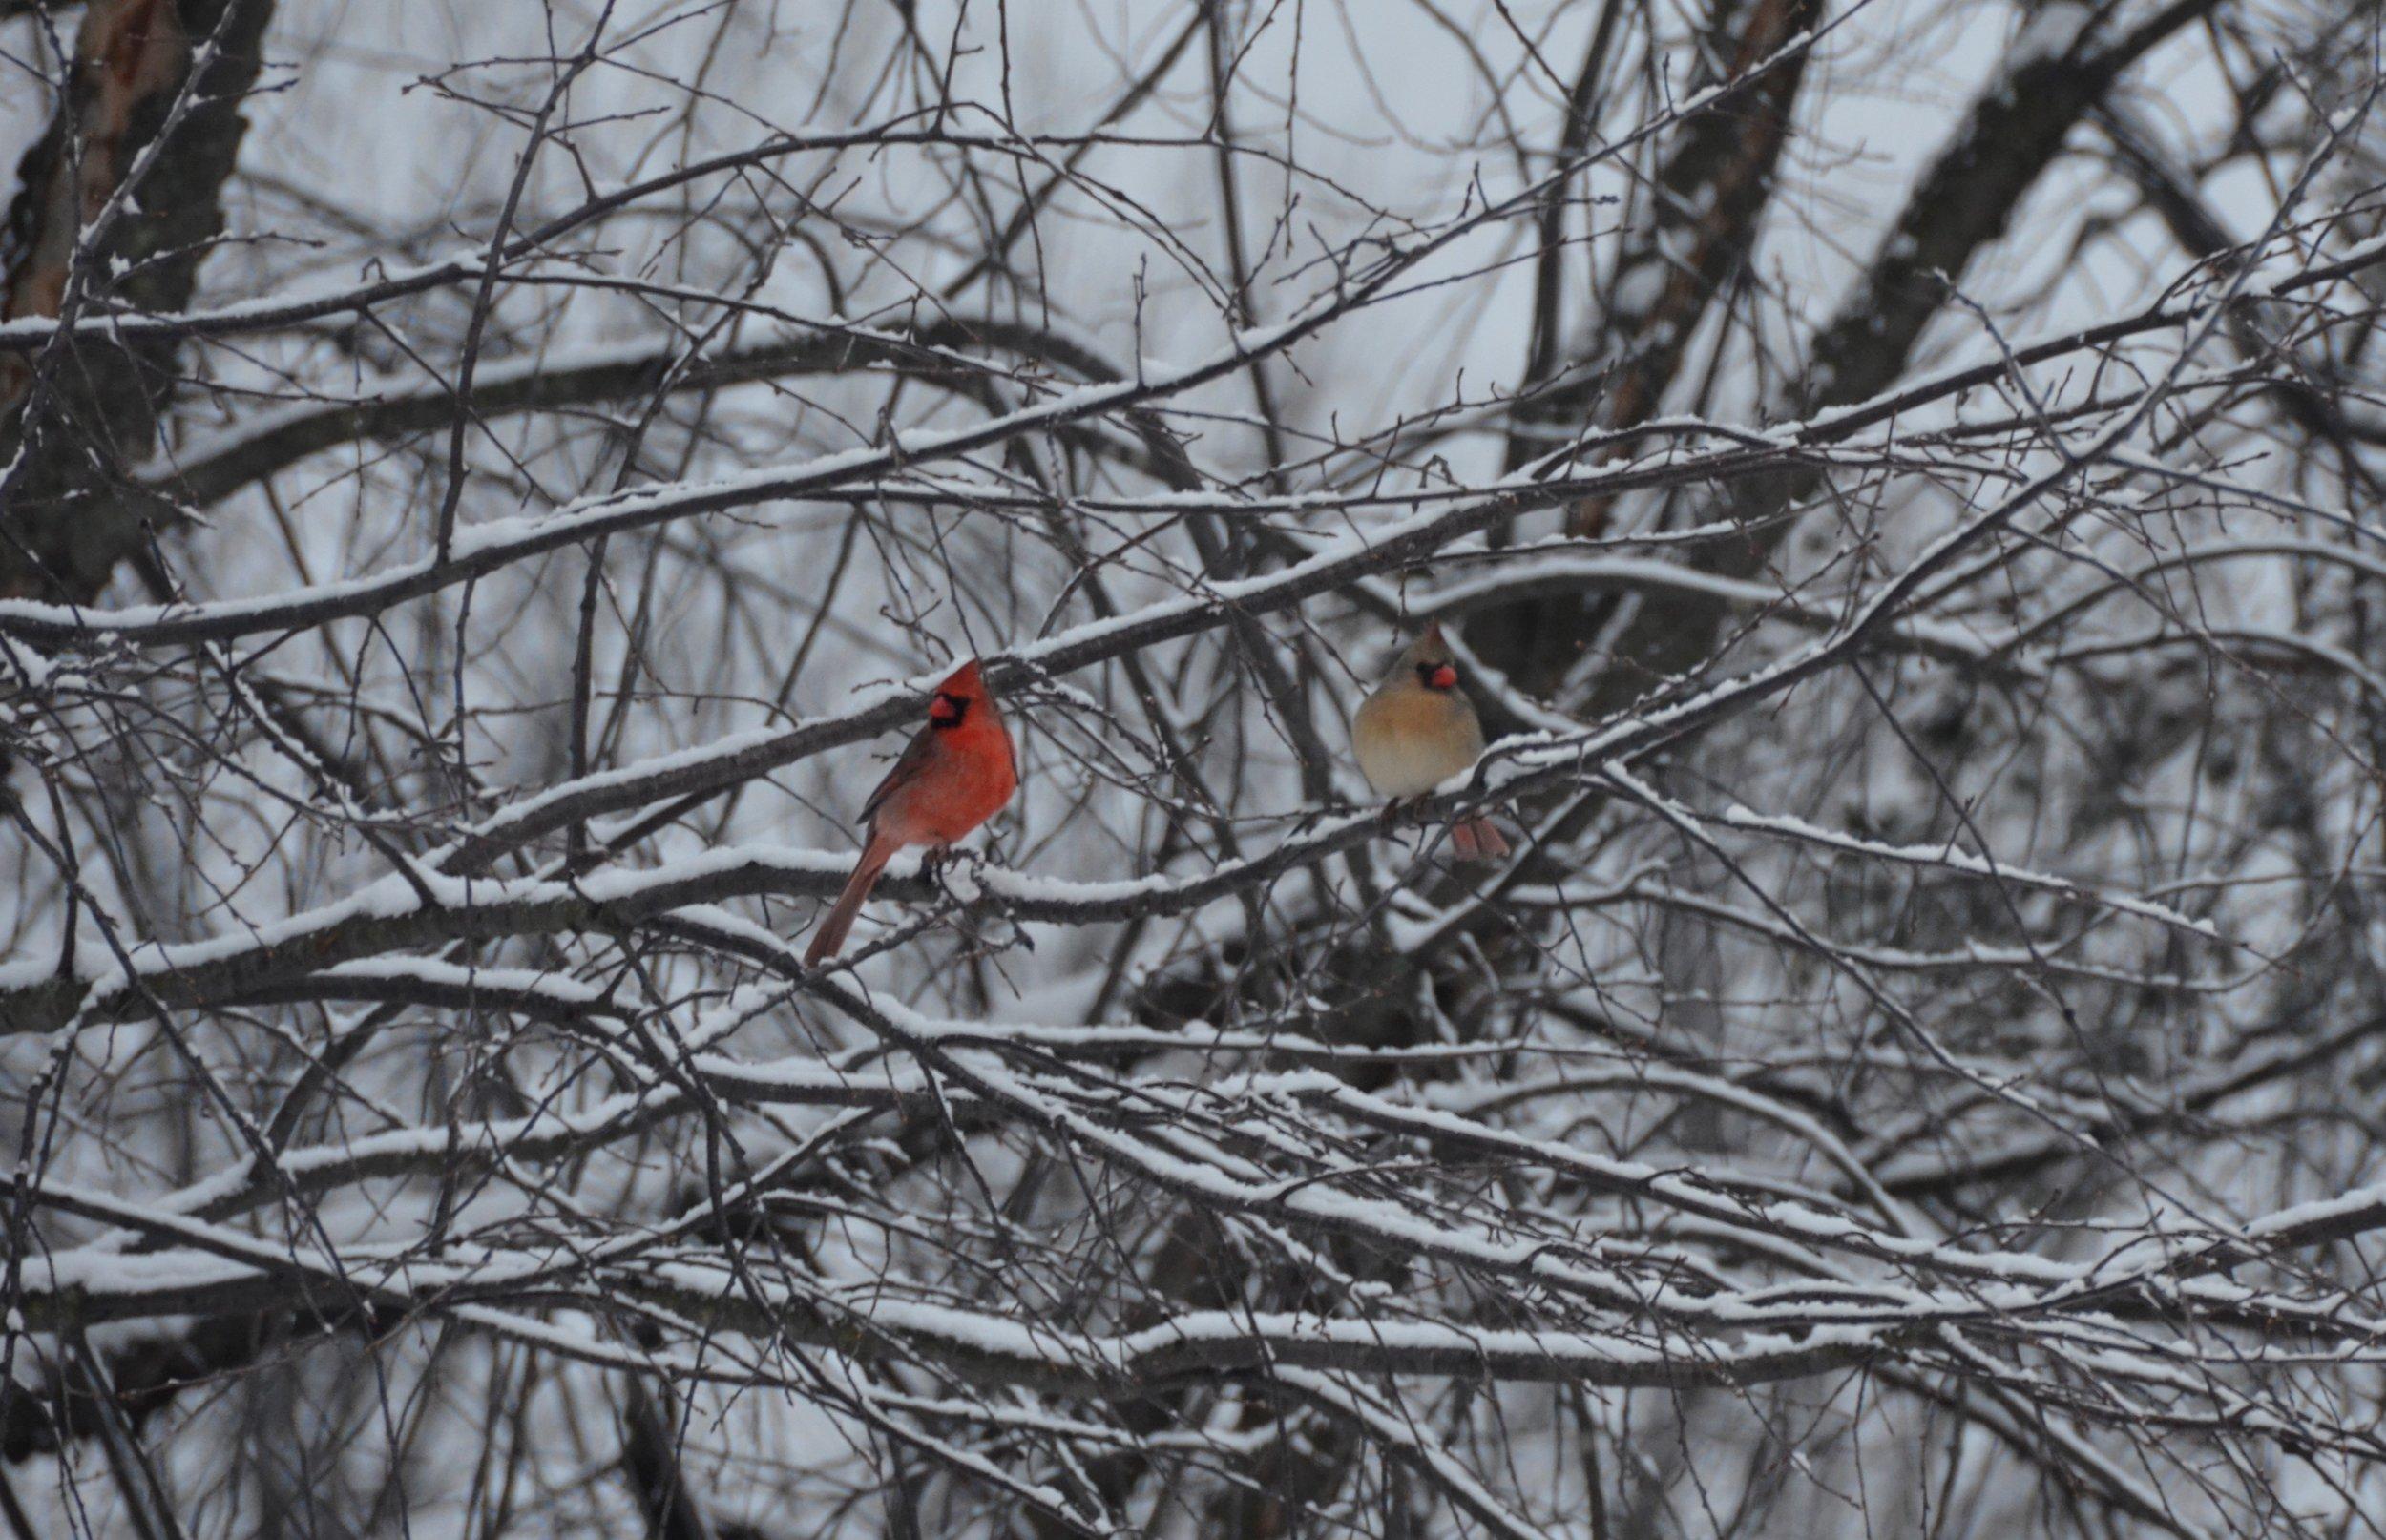 2017-03-17 19.19.29-2 cardinals.jpg